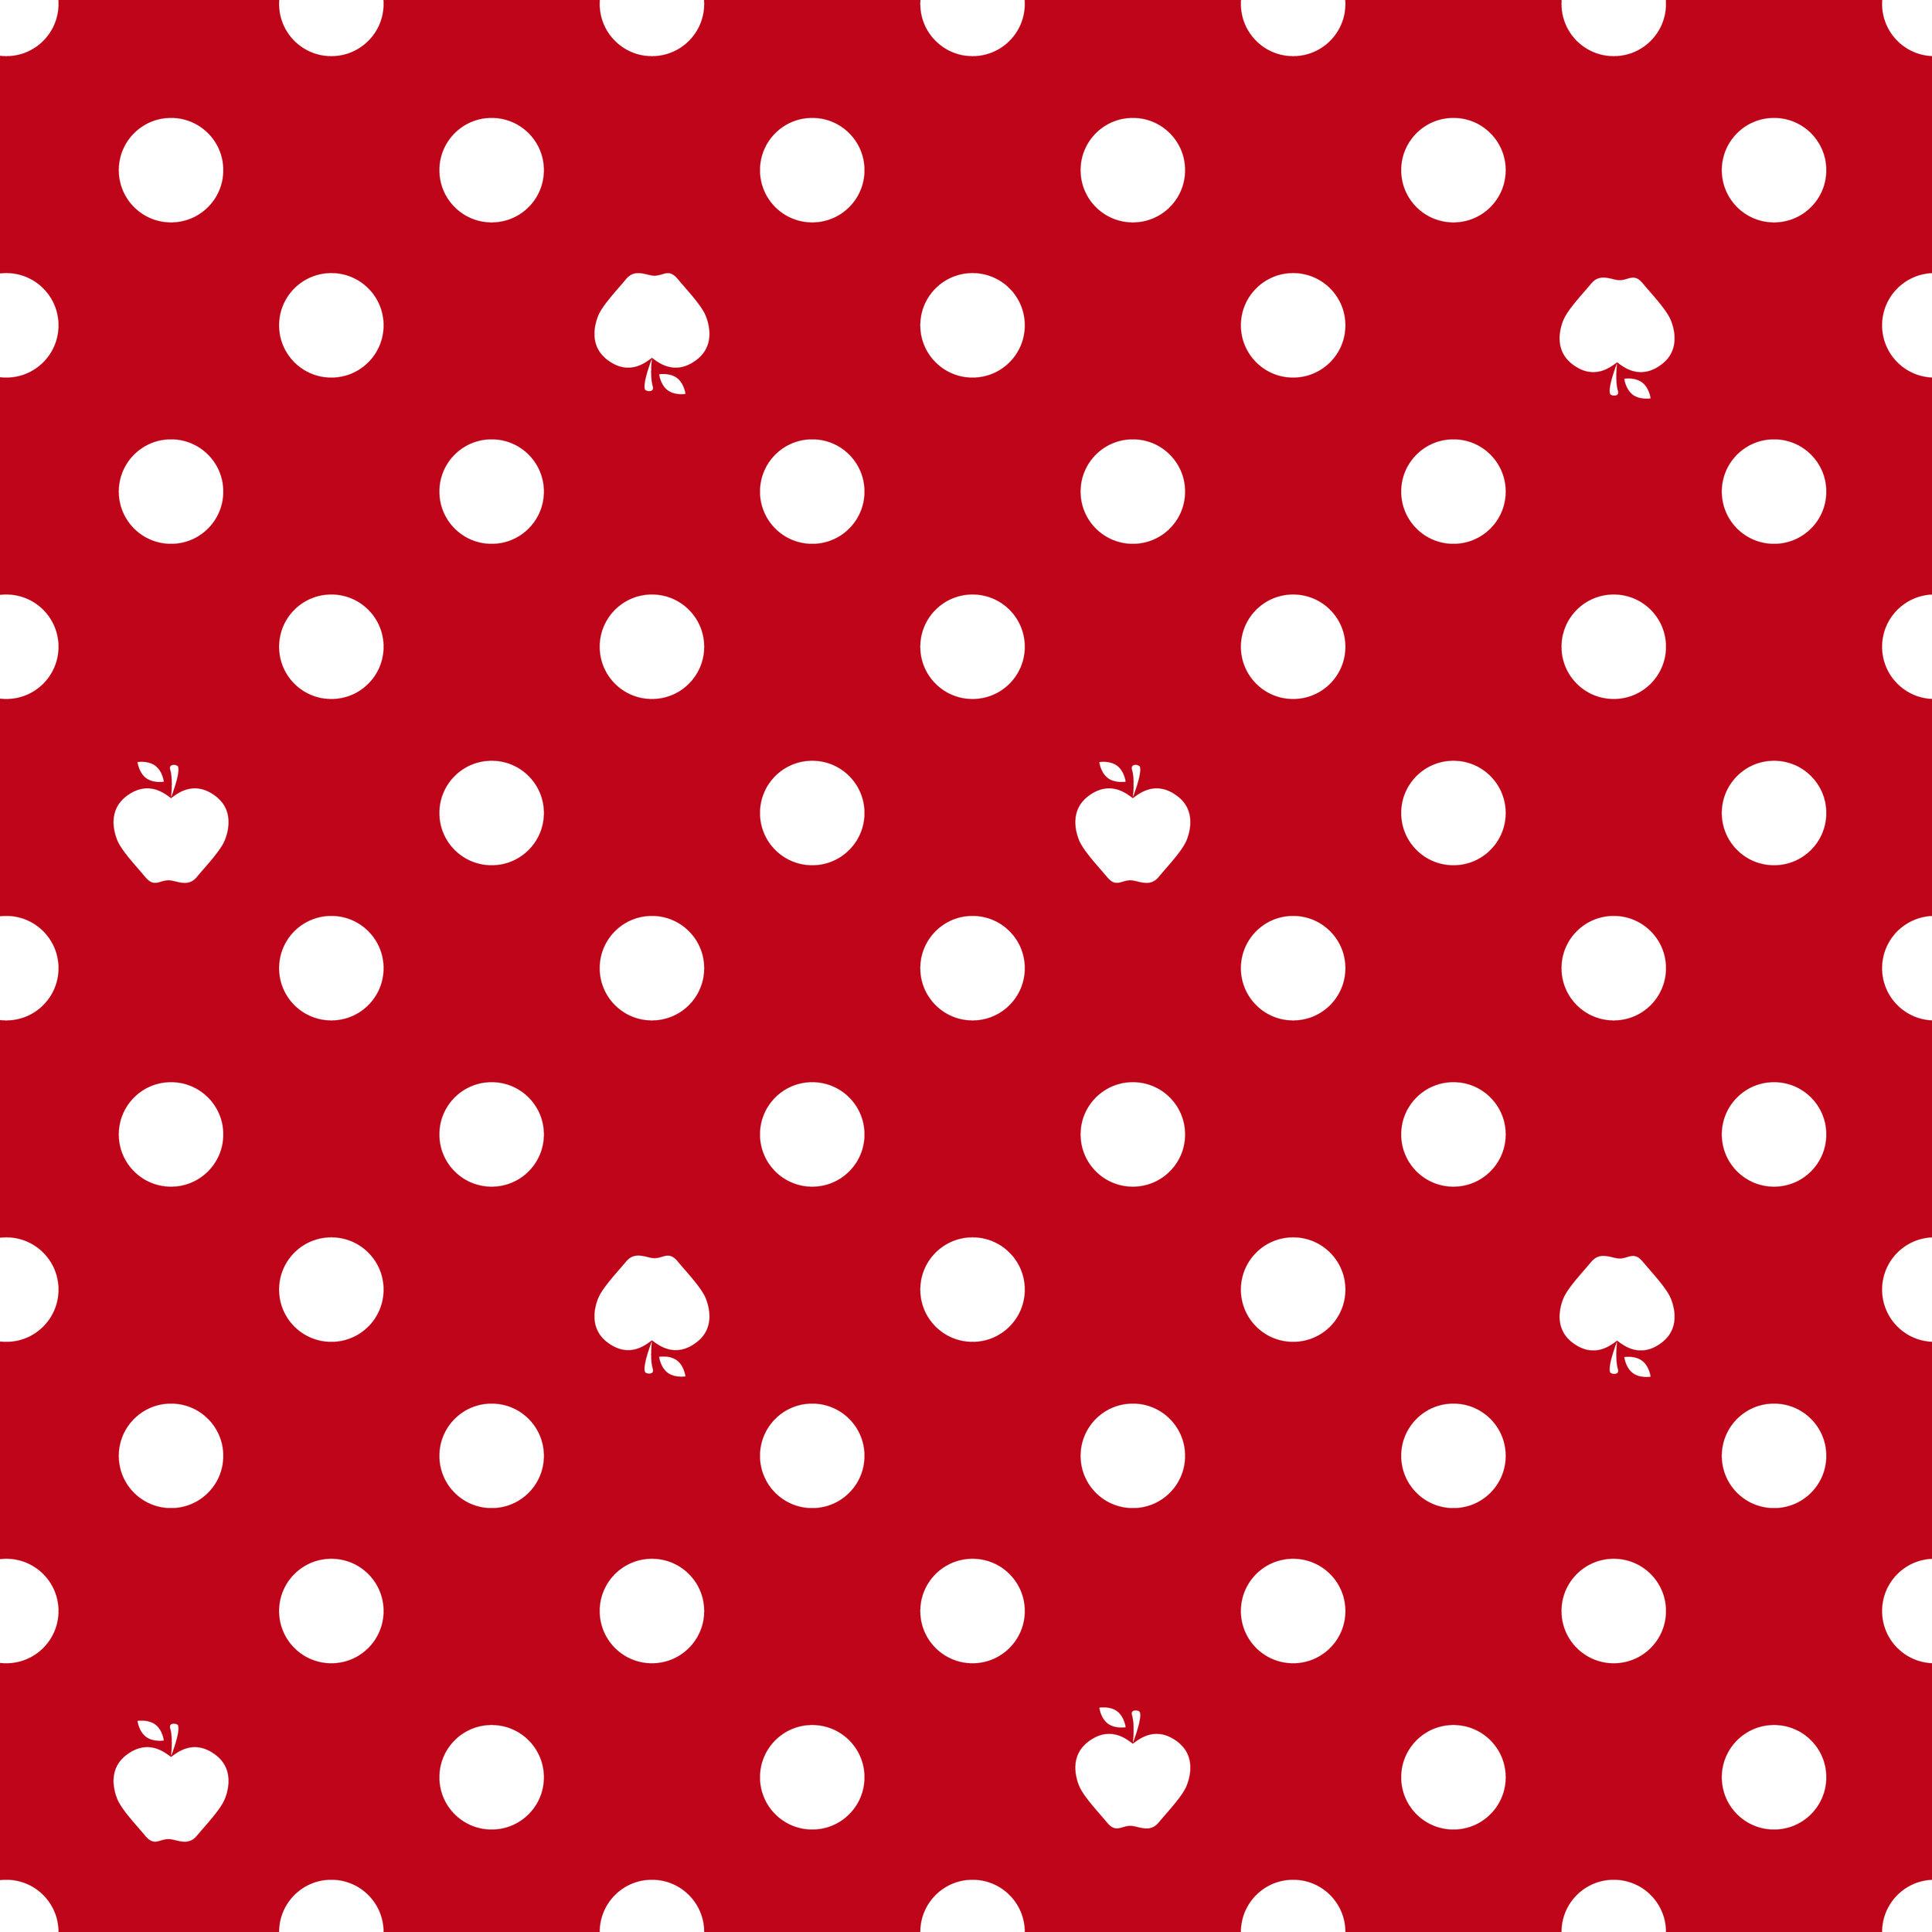 apple dots red-01.jpg